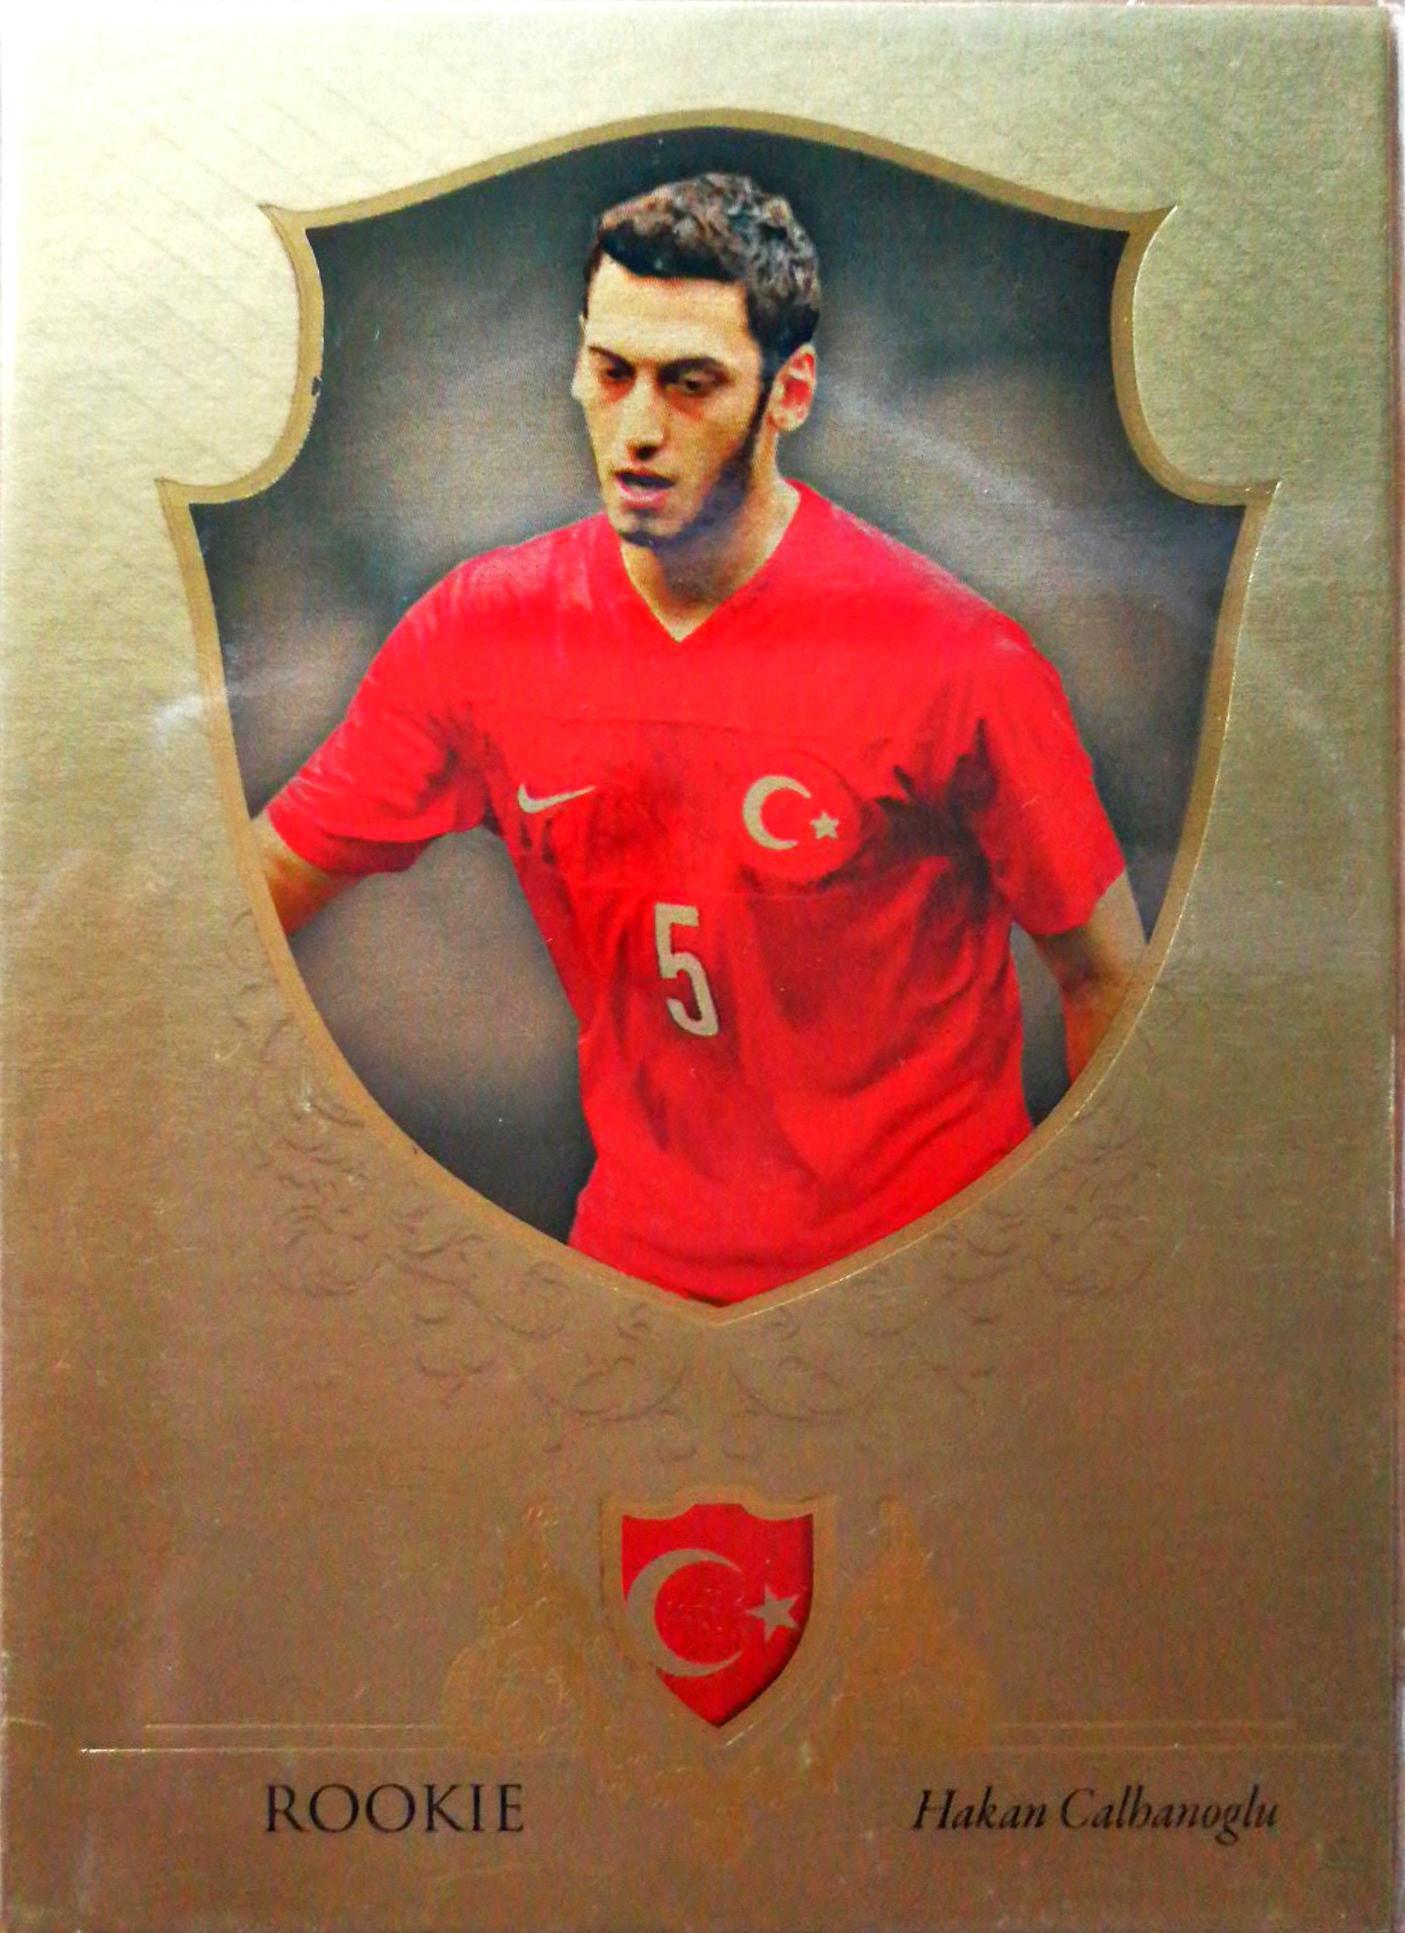 【Ed】2016Futera世界足球Unique特制版球星卡Hakan calhanoglu恰尔汗奥卢土耳其1/11NO.091基础卡特殊号